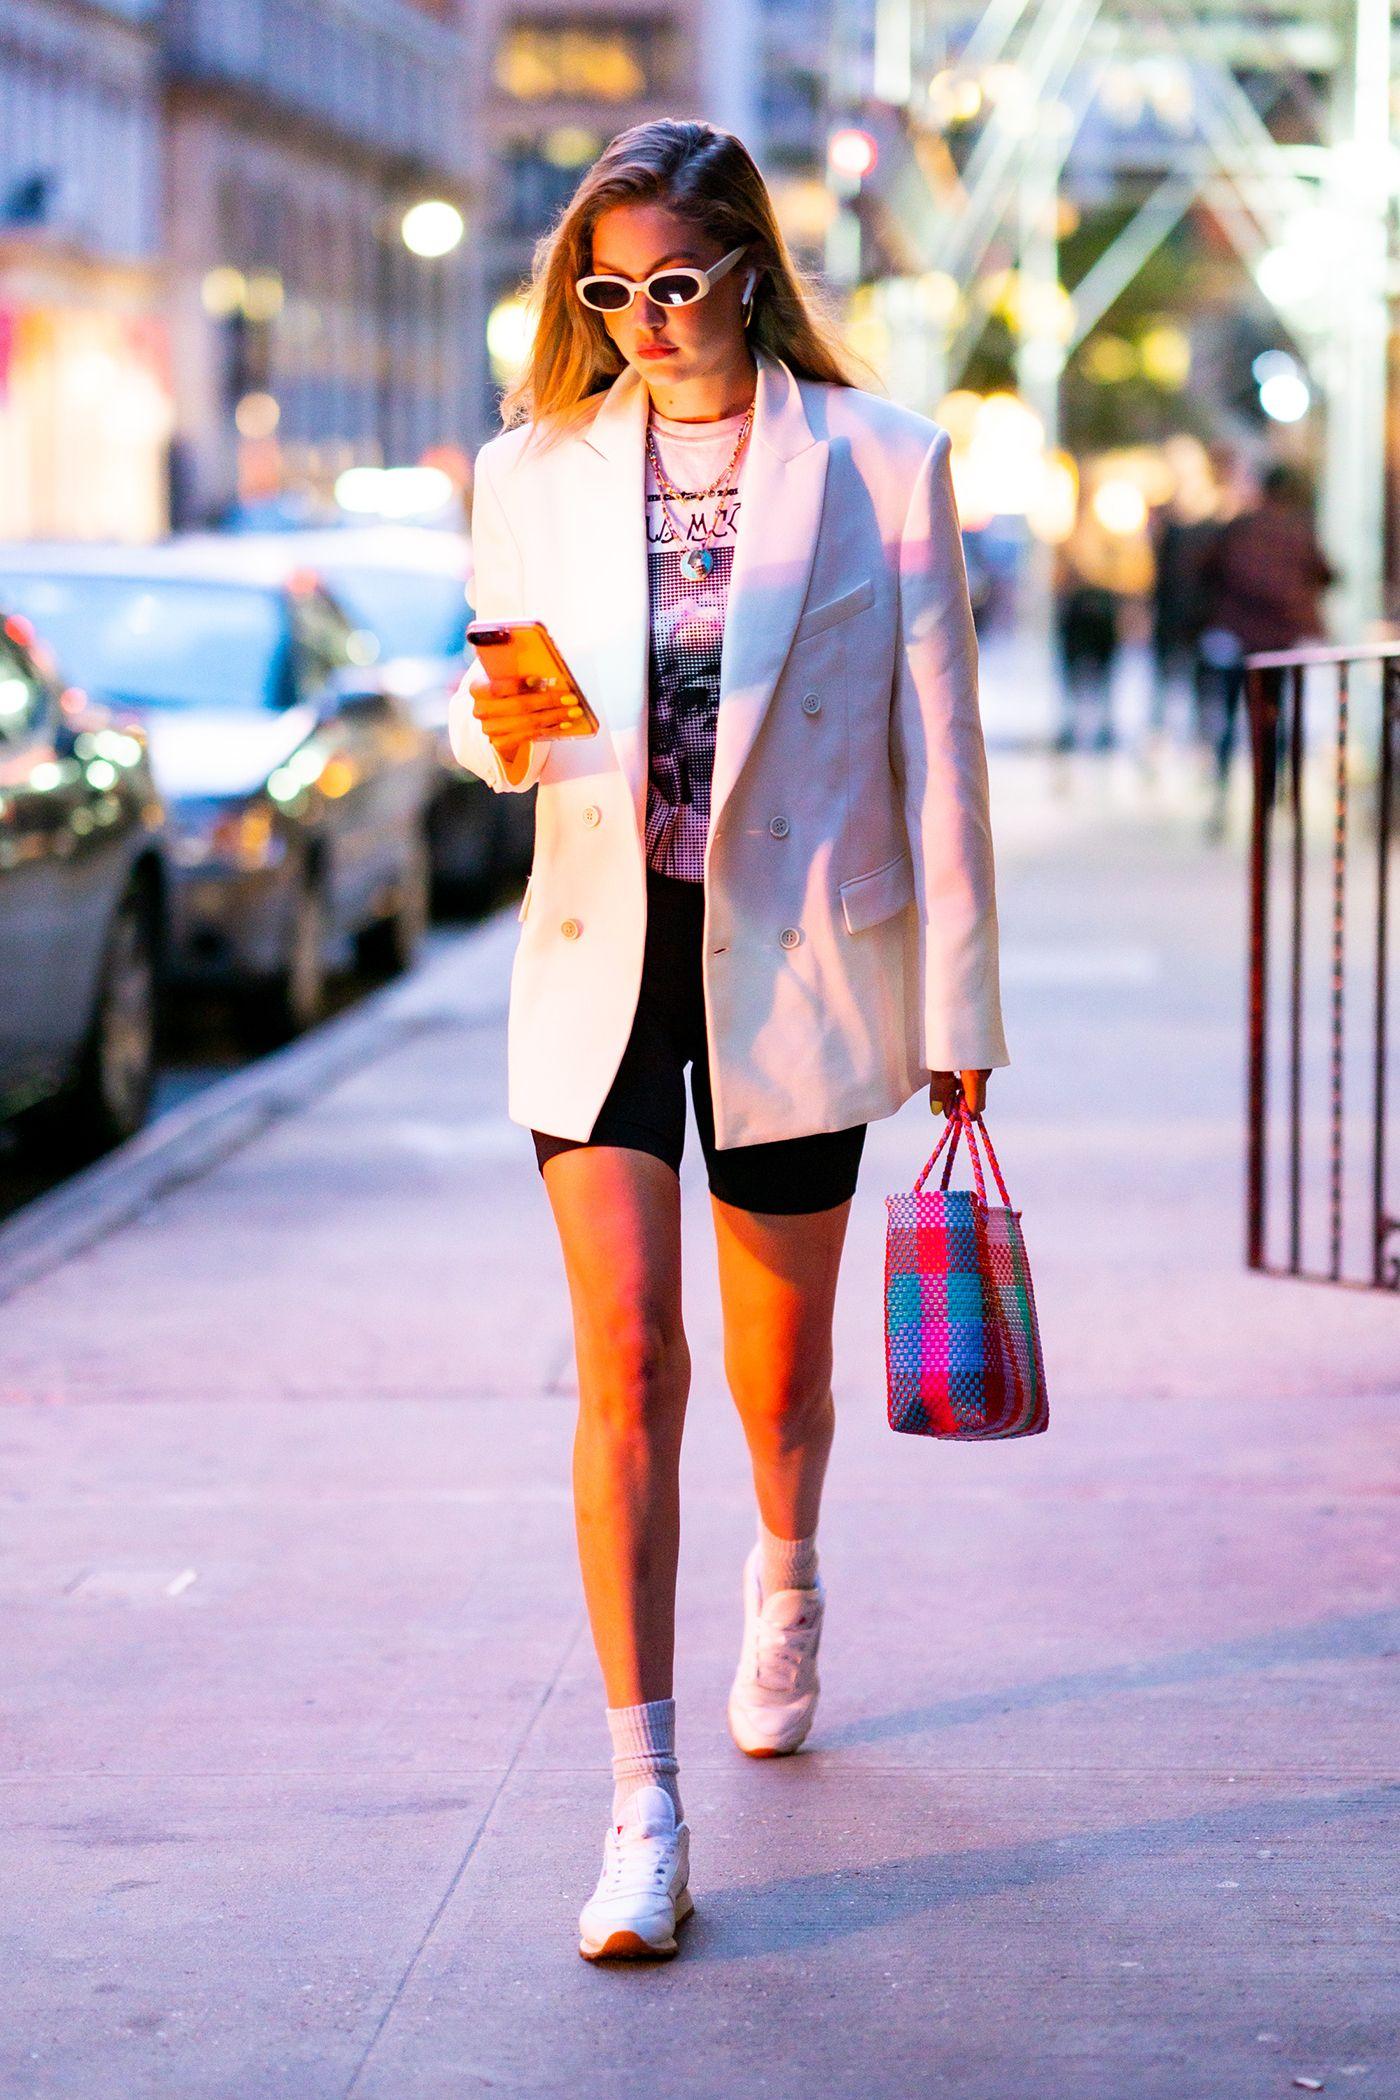 Celeb Look of the Week: Gigi Hadid Looking Extremely 2019